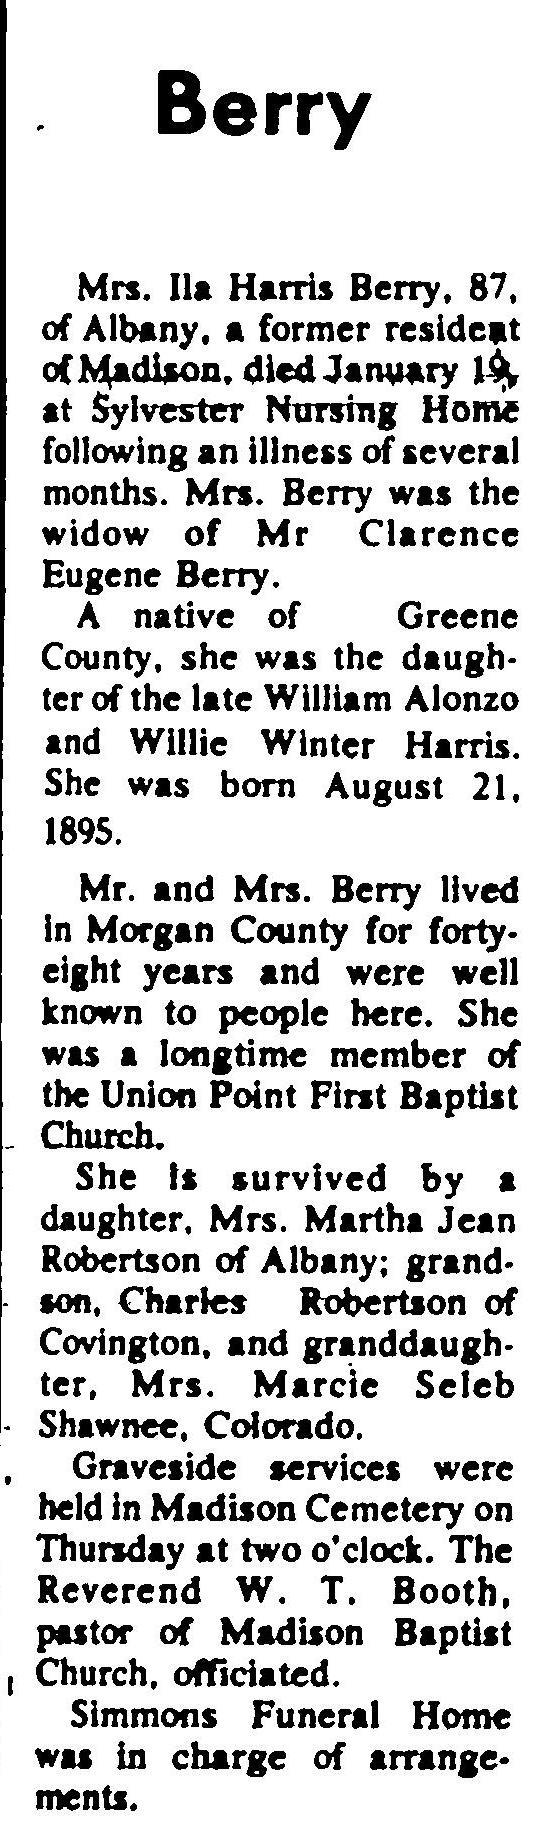 berry_ilalouiseharris_1983-obituary.jpeg